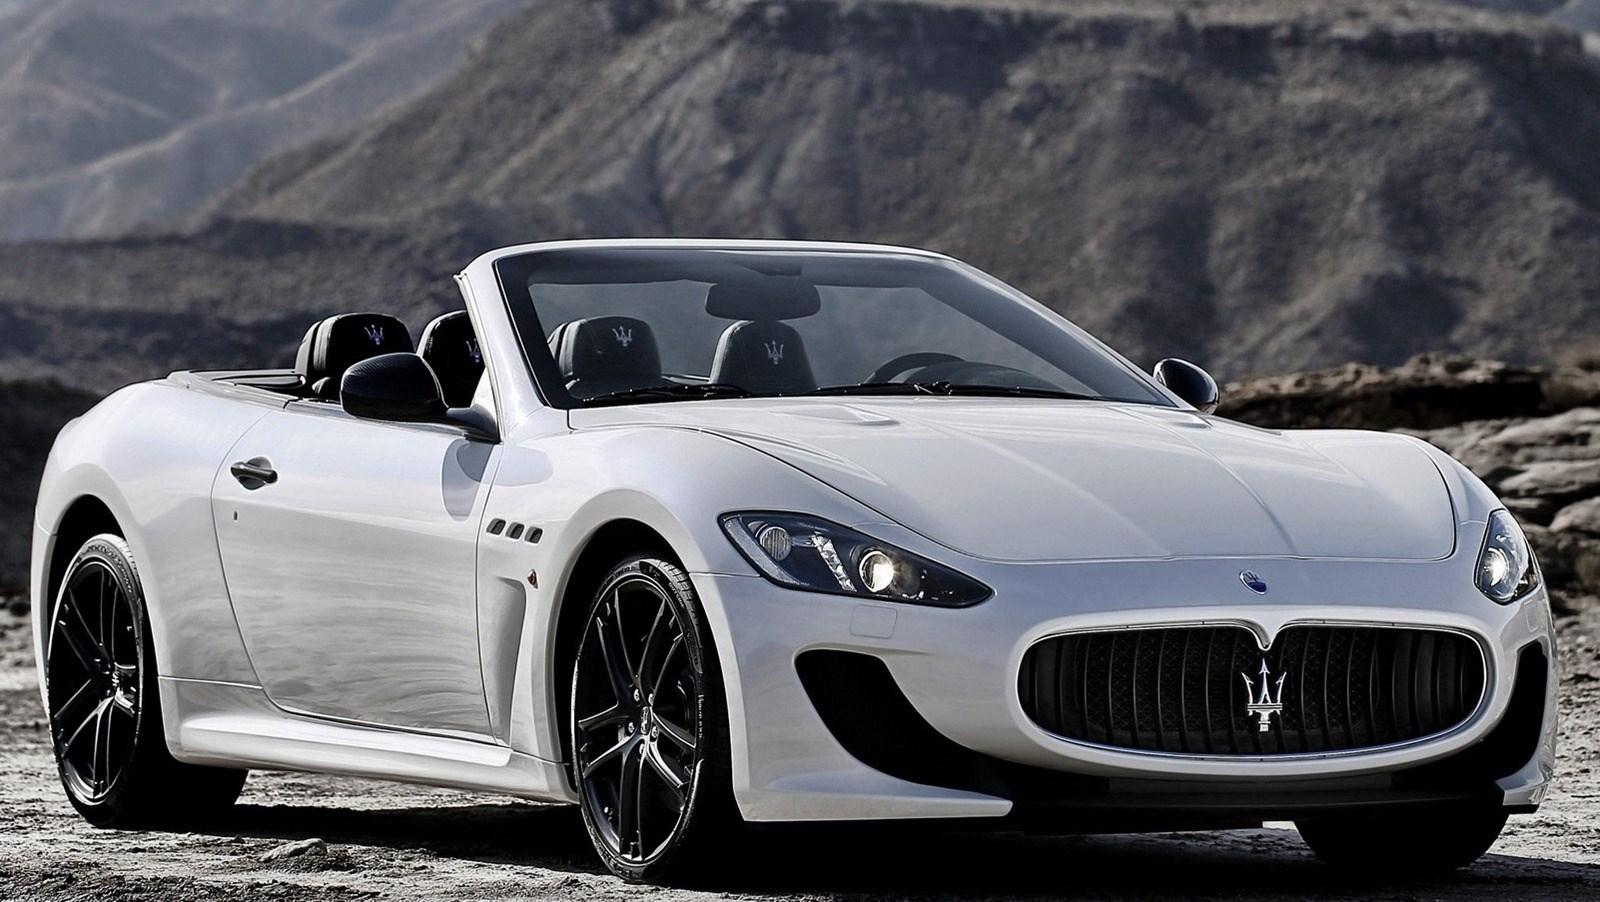 2015 Maserati GranCabrio Pictures